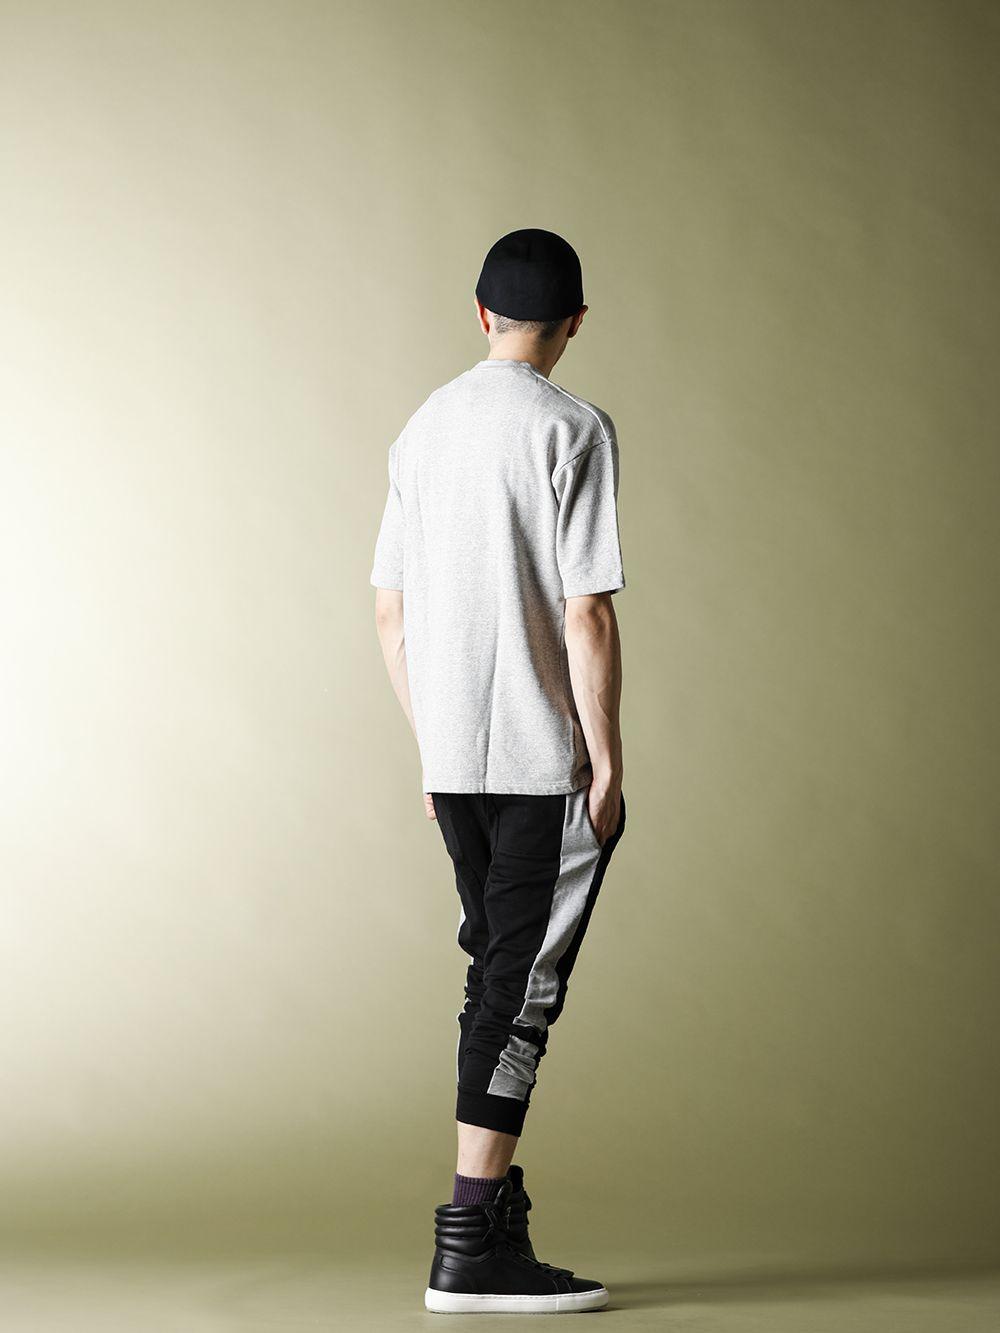 .LOGY kyoto 20SS 【 RIPVANWINKLE × VEILANCE 】BLAZER LT STYLING!!! - 4-005